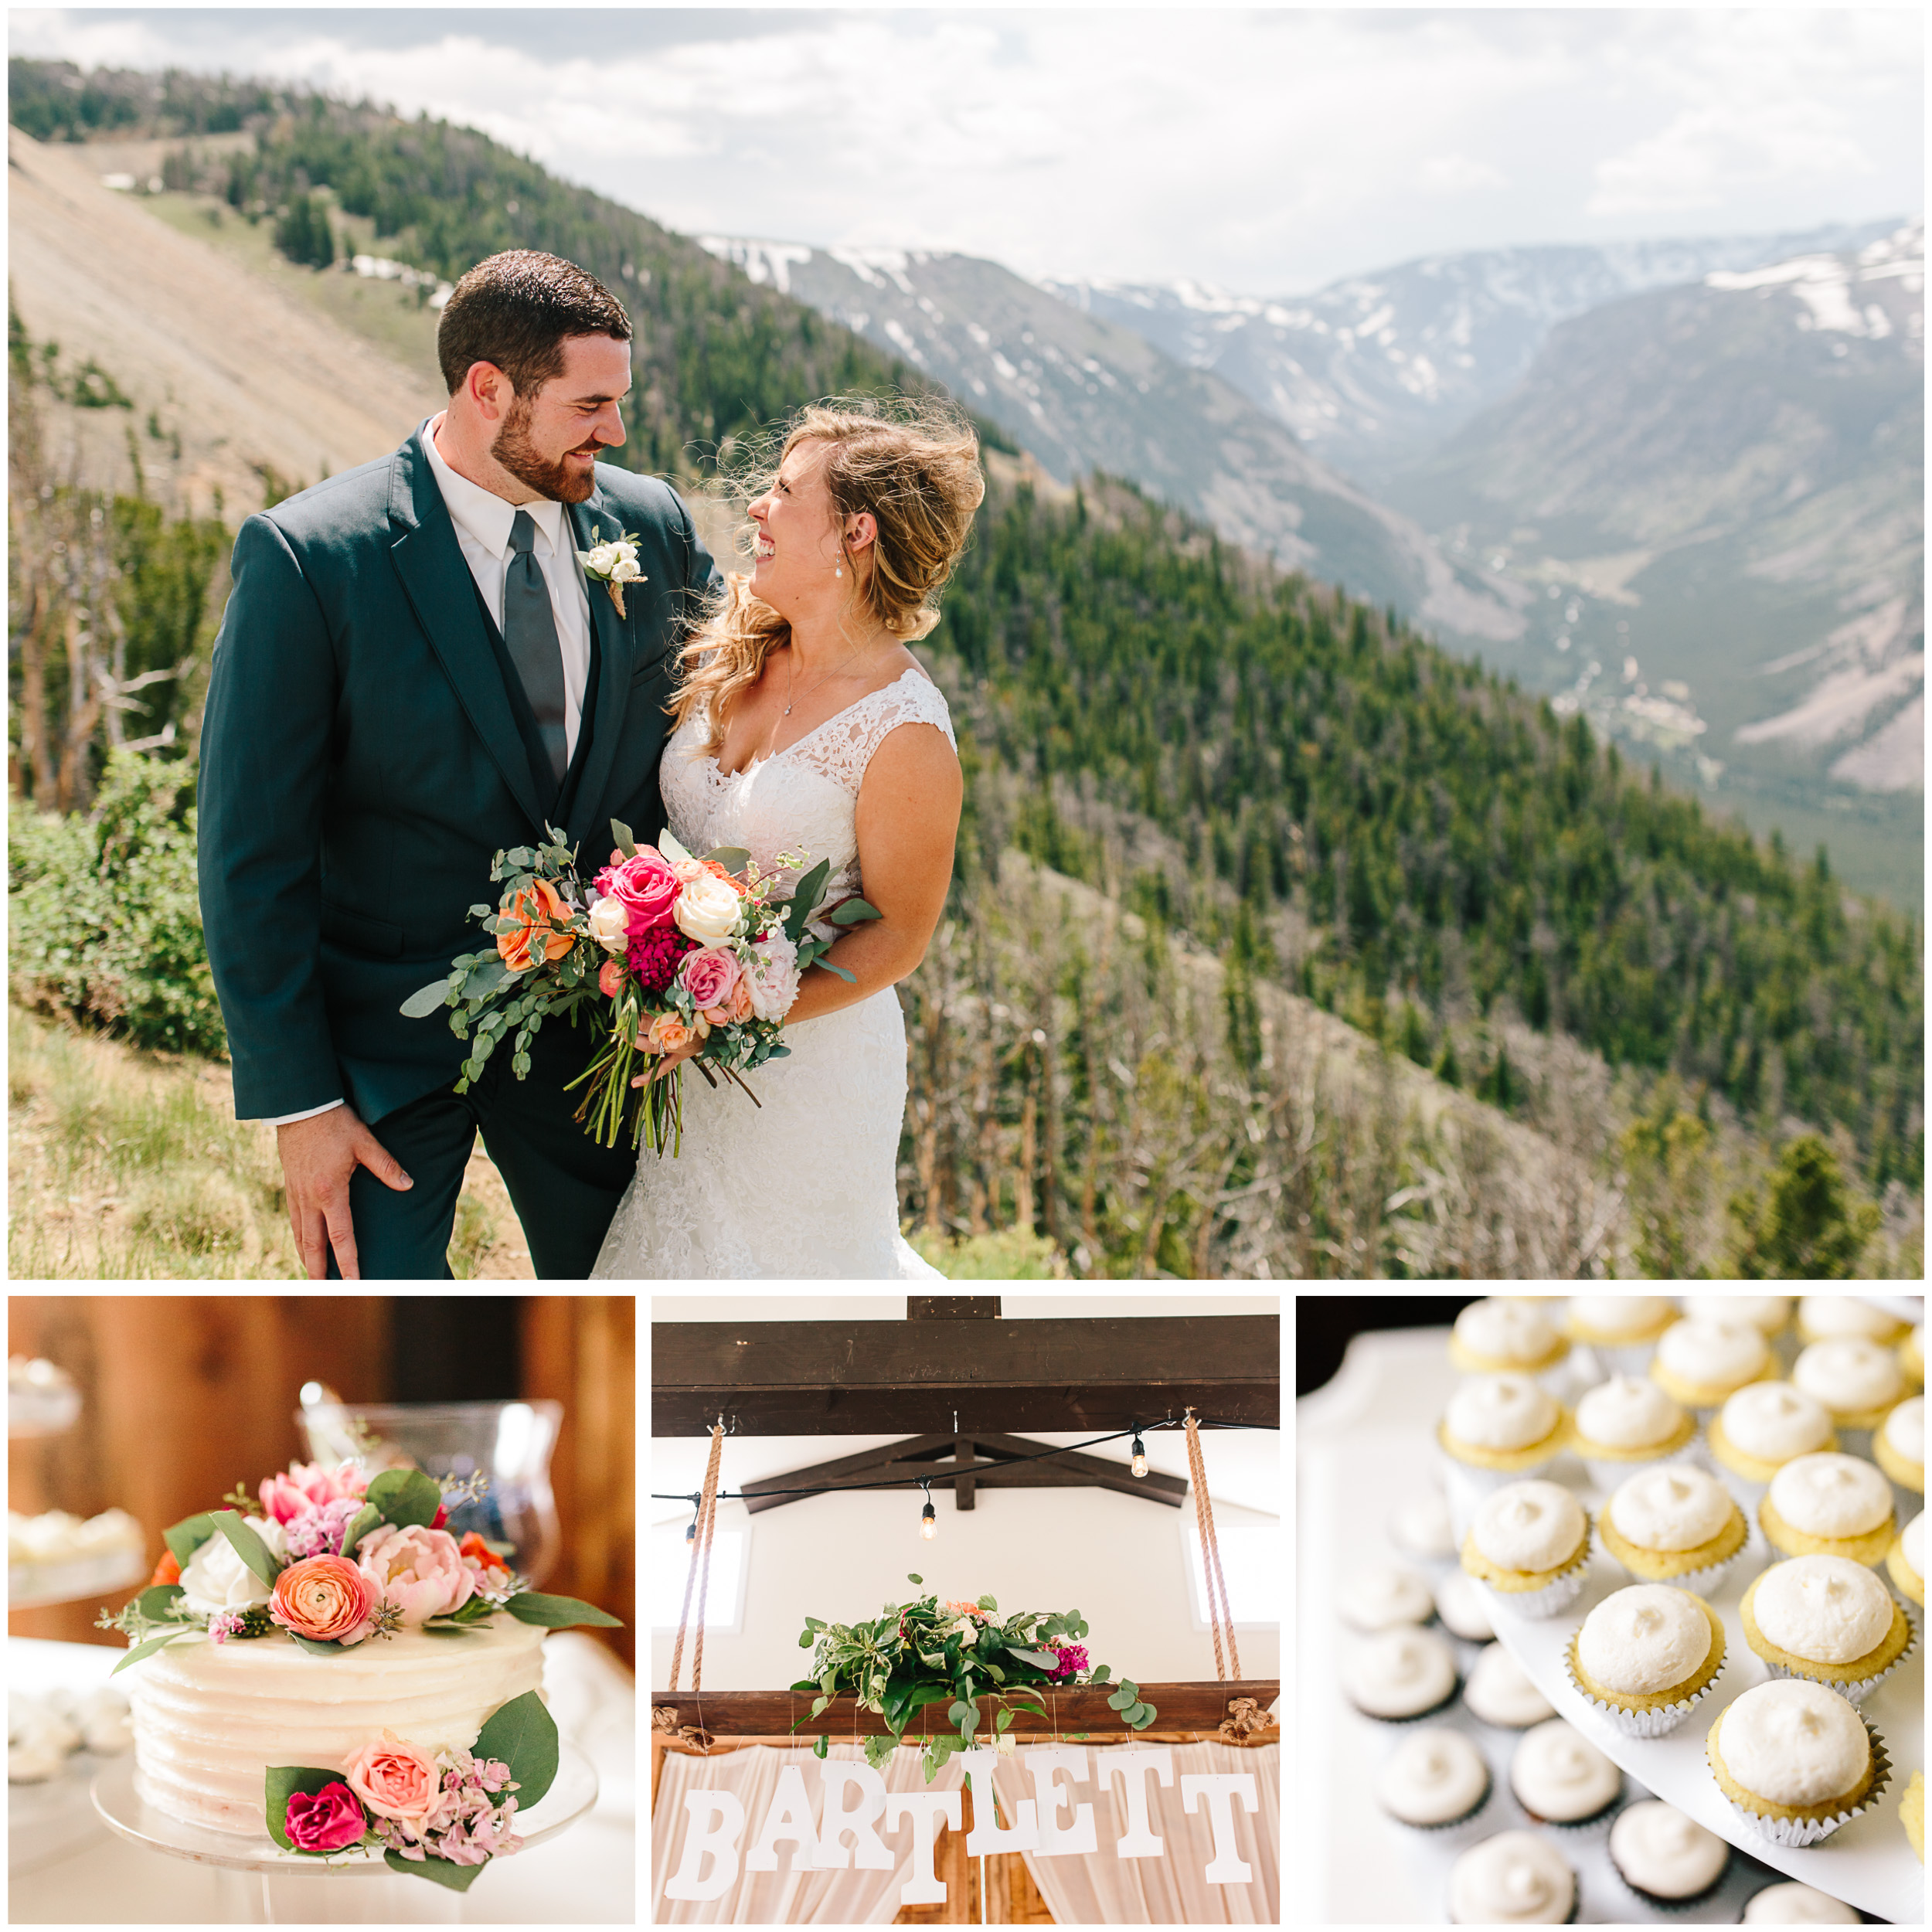 redlodge_montana_wedding_header.jpg